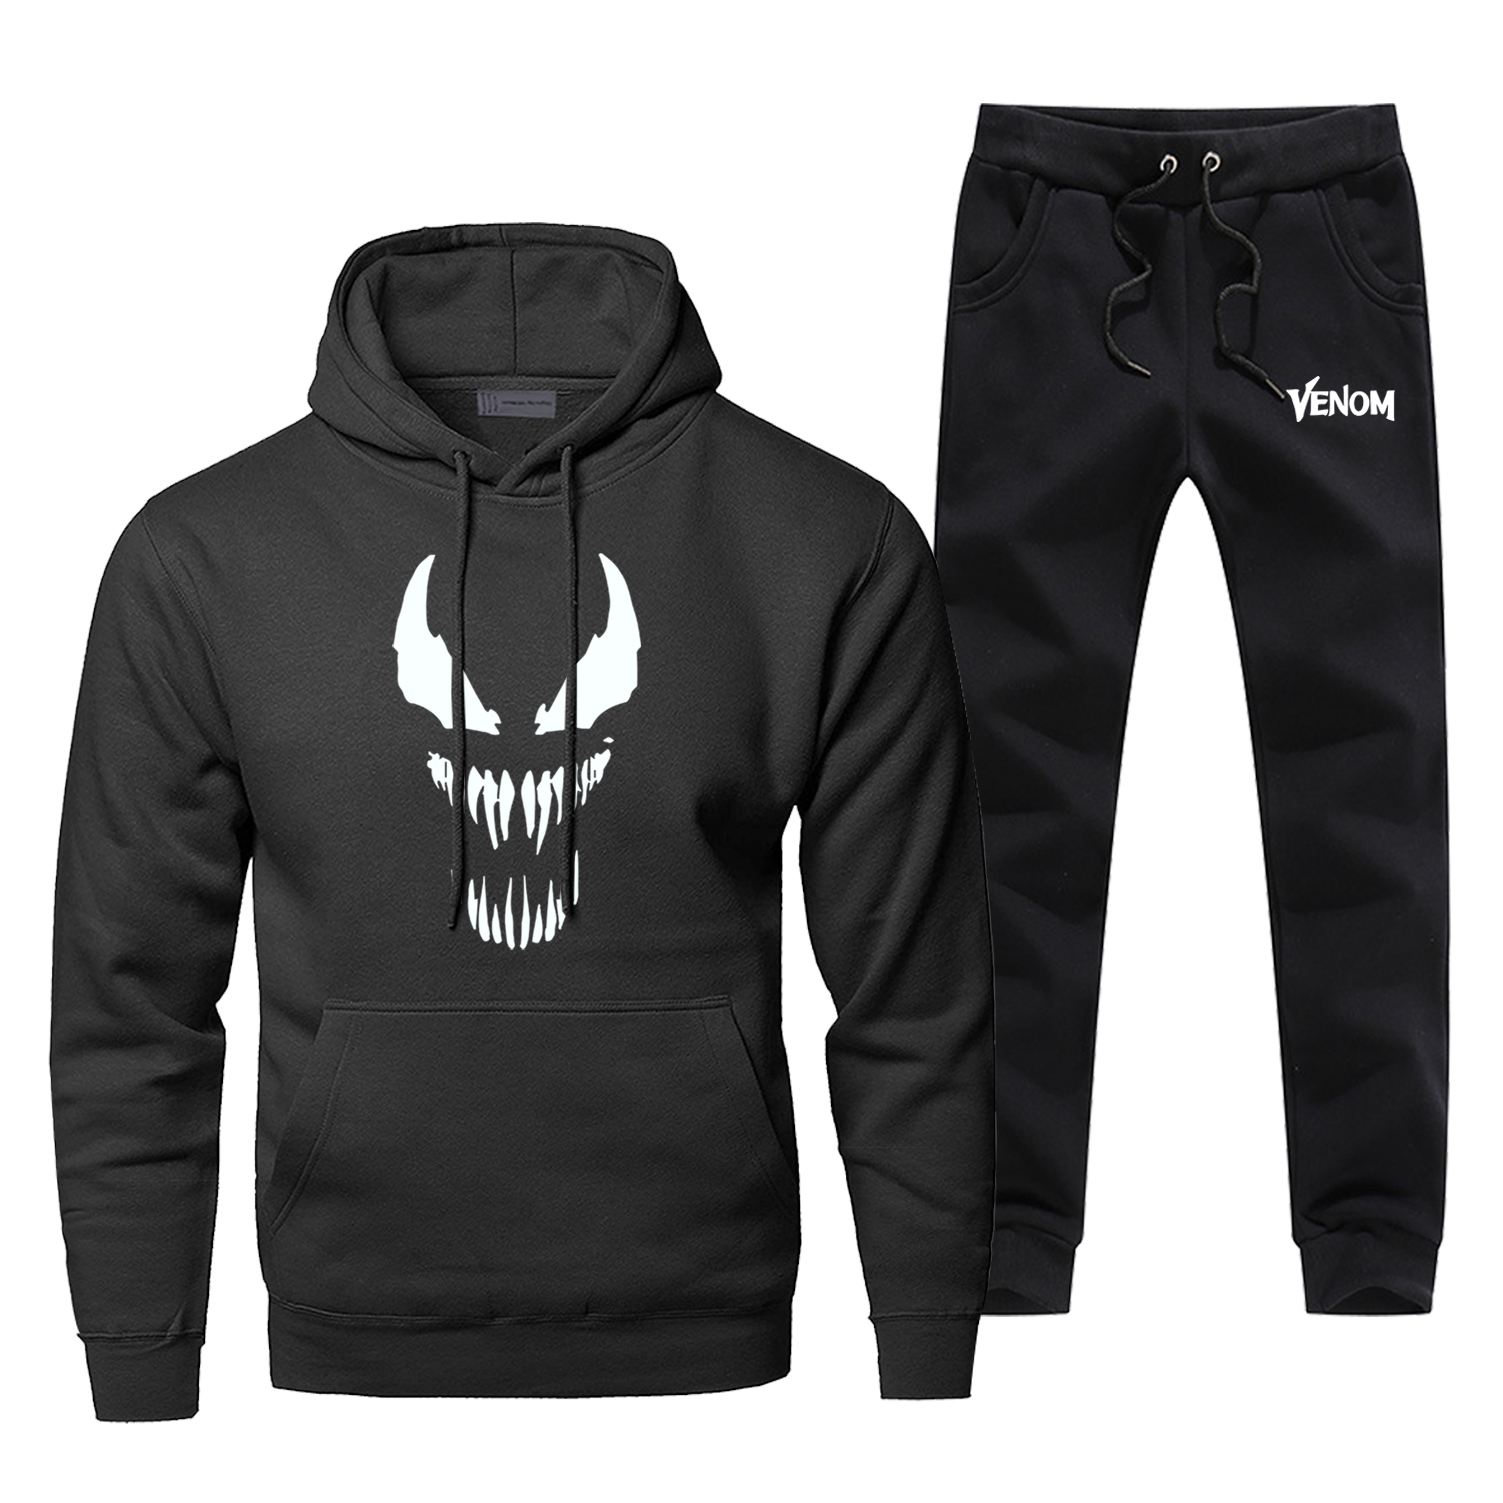 Venom Edward Hoodie Pants Men Sets Track Suit Movie Superhero Tops Pant Sweatshirt Sweatpants Sportswear Autumn Sports Tracksuit